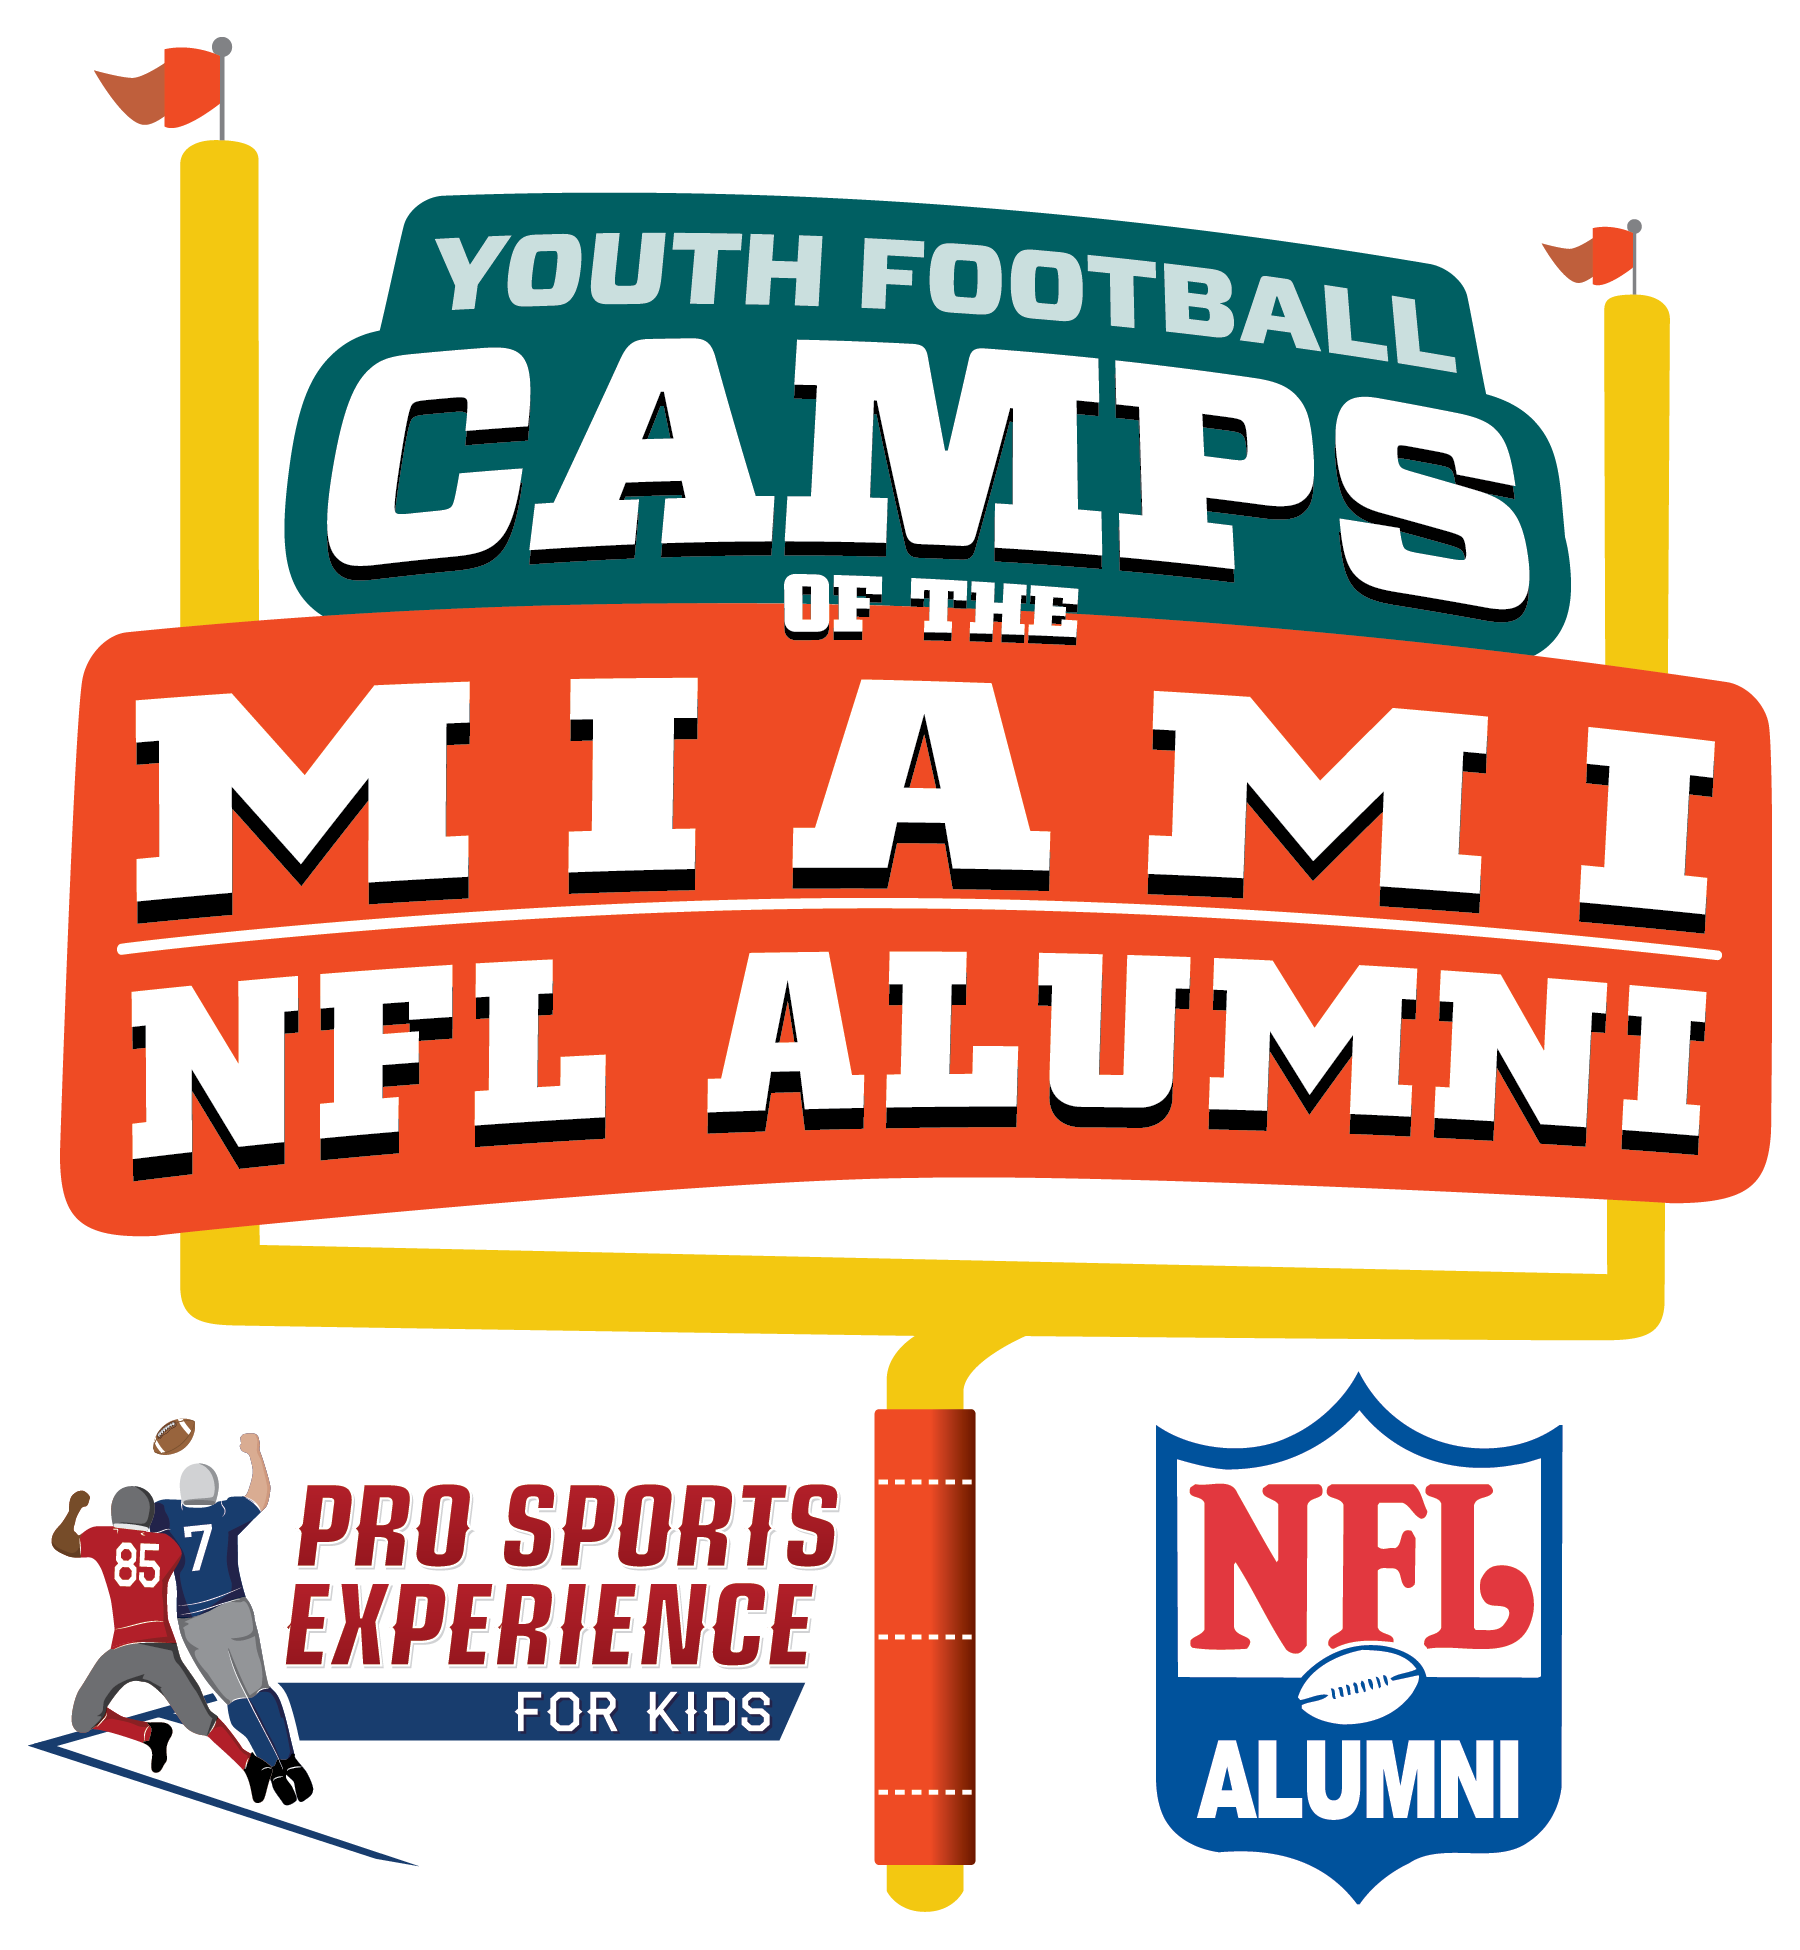 Miami NFL Alumni Hero Youth Football Camps - Miami